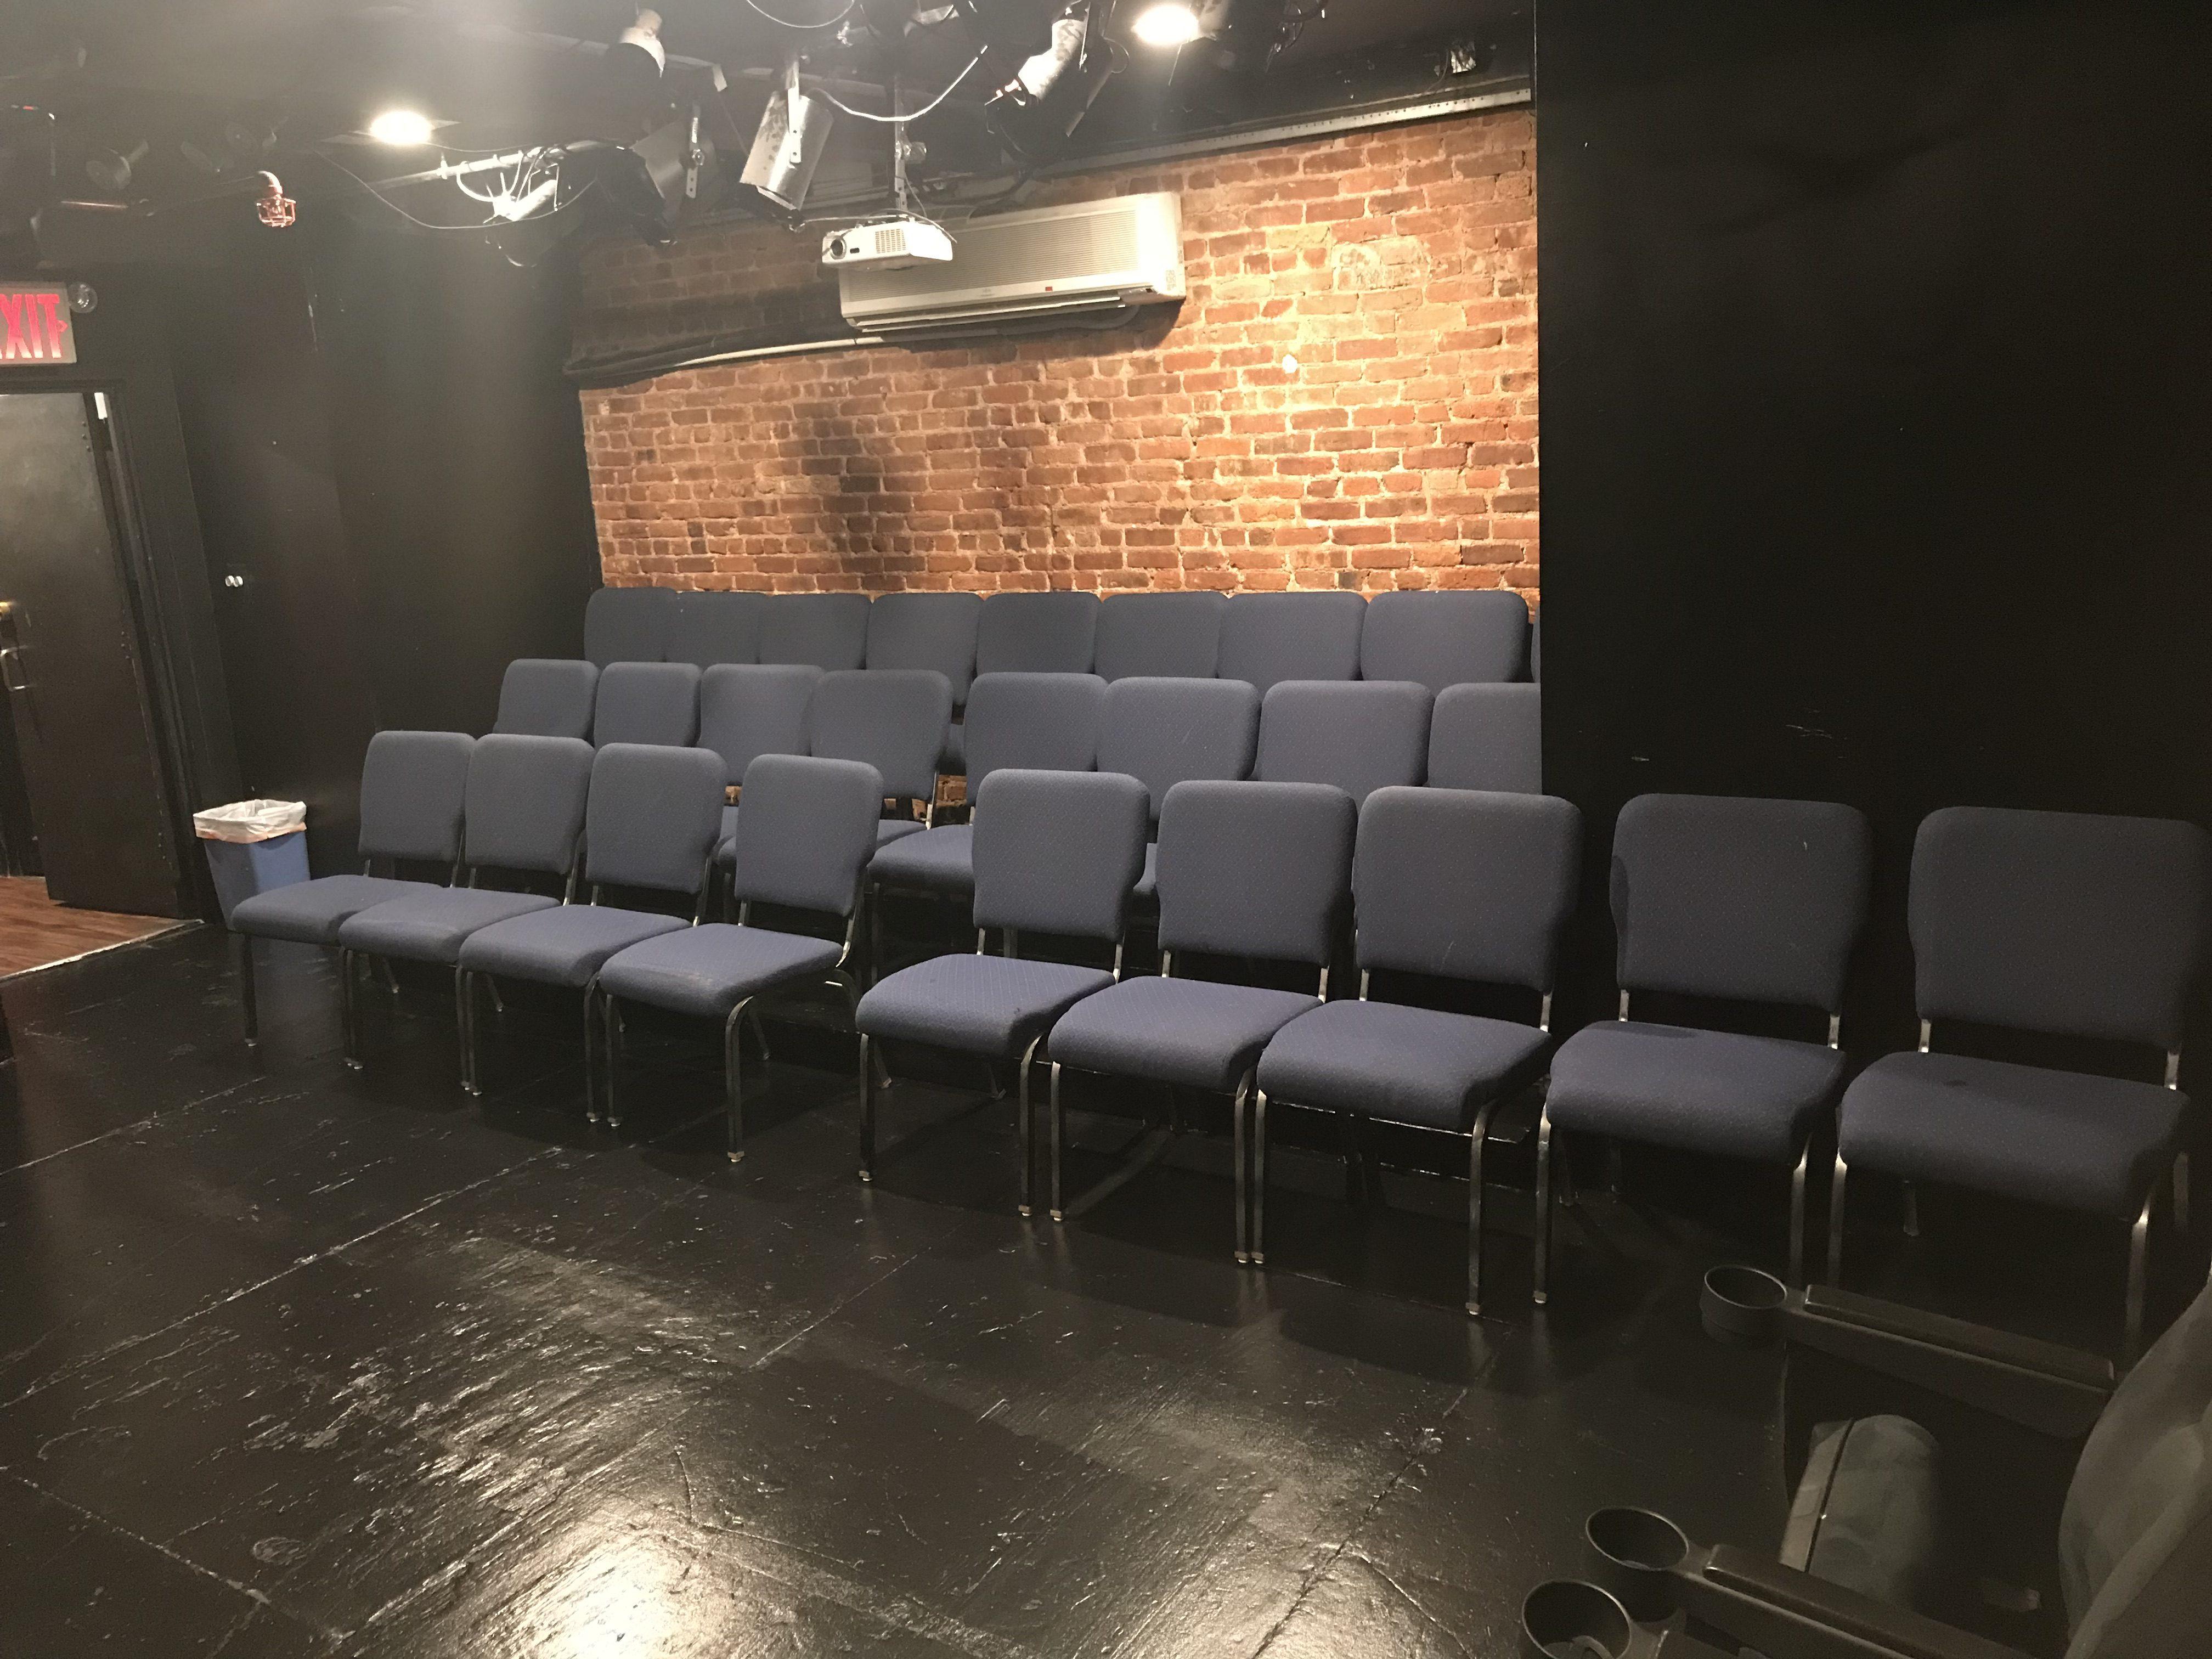 30 Seats